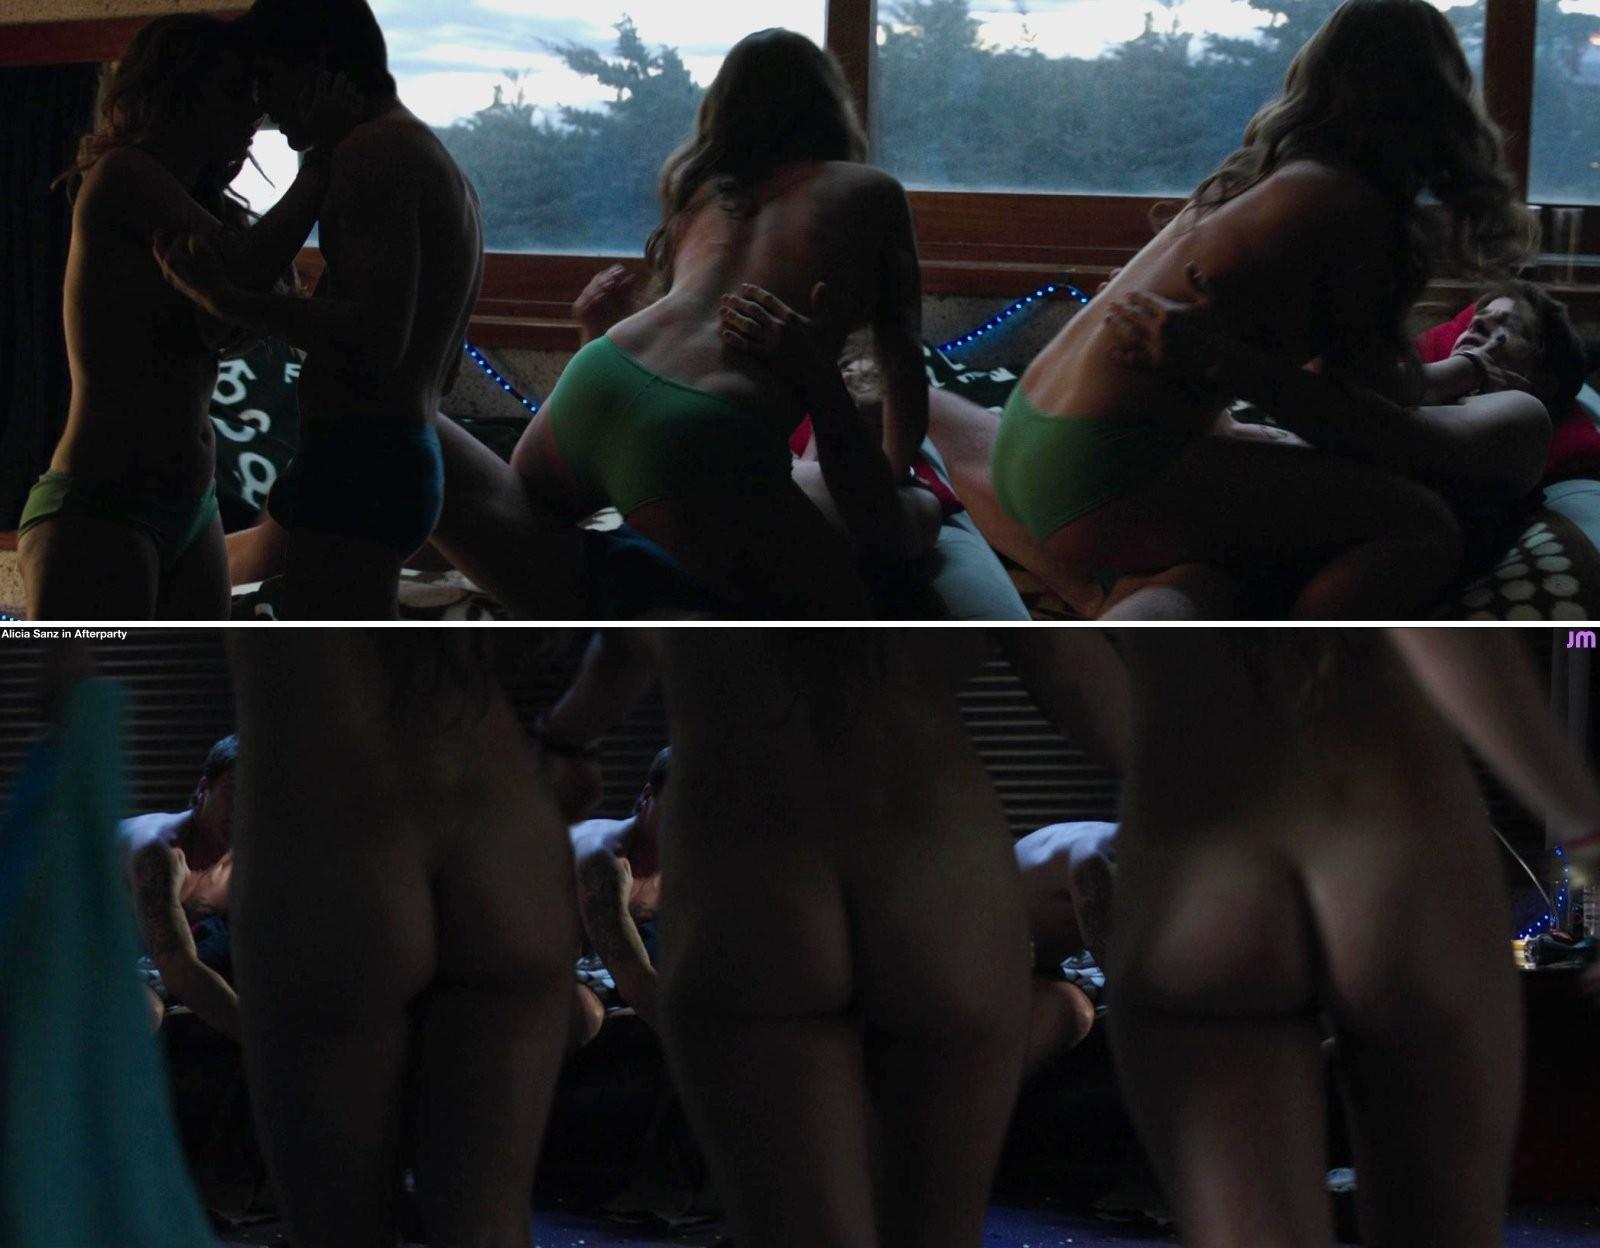 Alicia Sanz fotos desnuda hackeadas